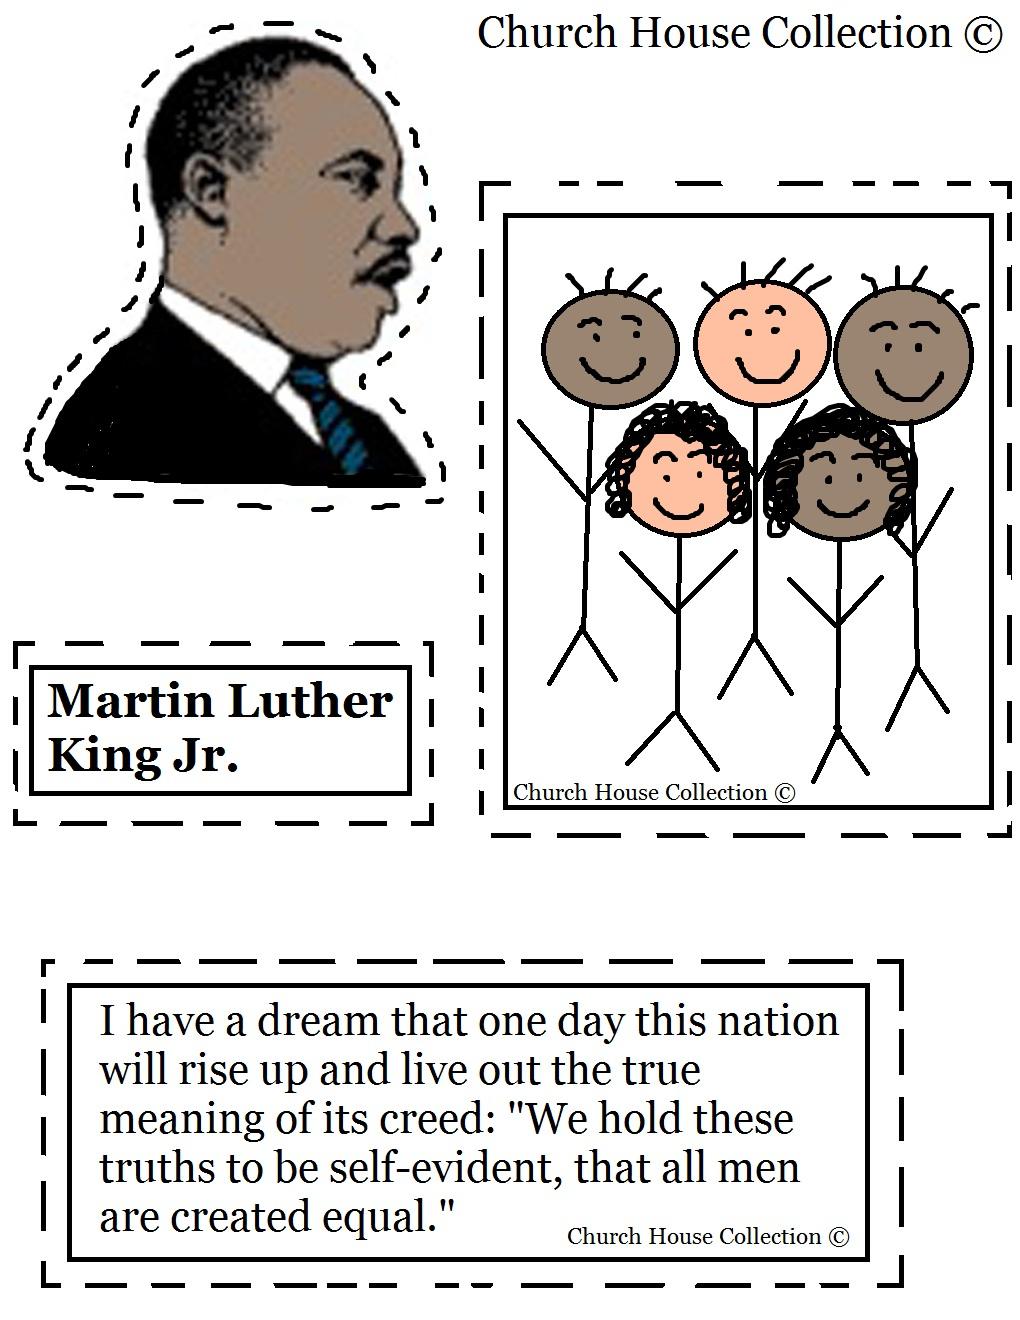 Coloring Pages ~ Free Printable Coloringes Of Martin Luther King Jr | Free Printable Martin Luther King Jr Worksheets For Kindergarten